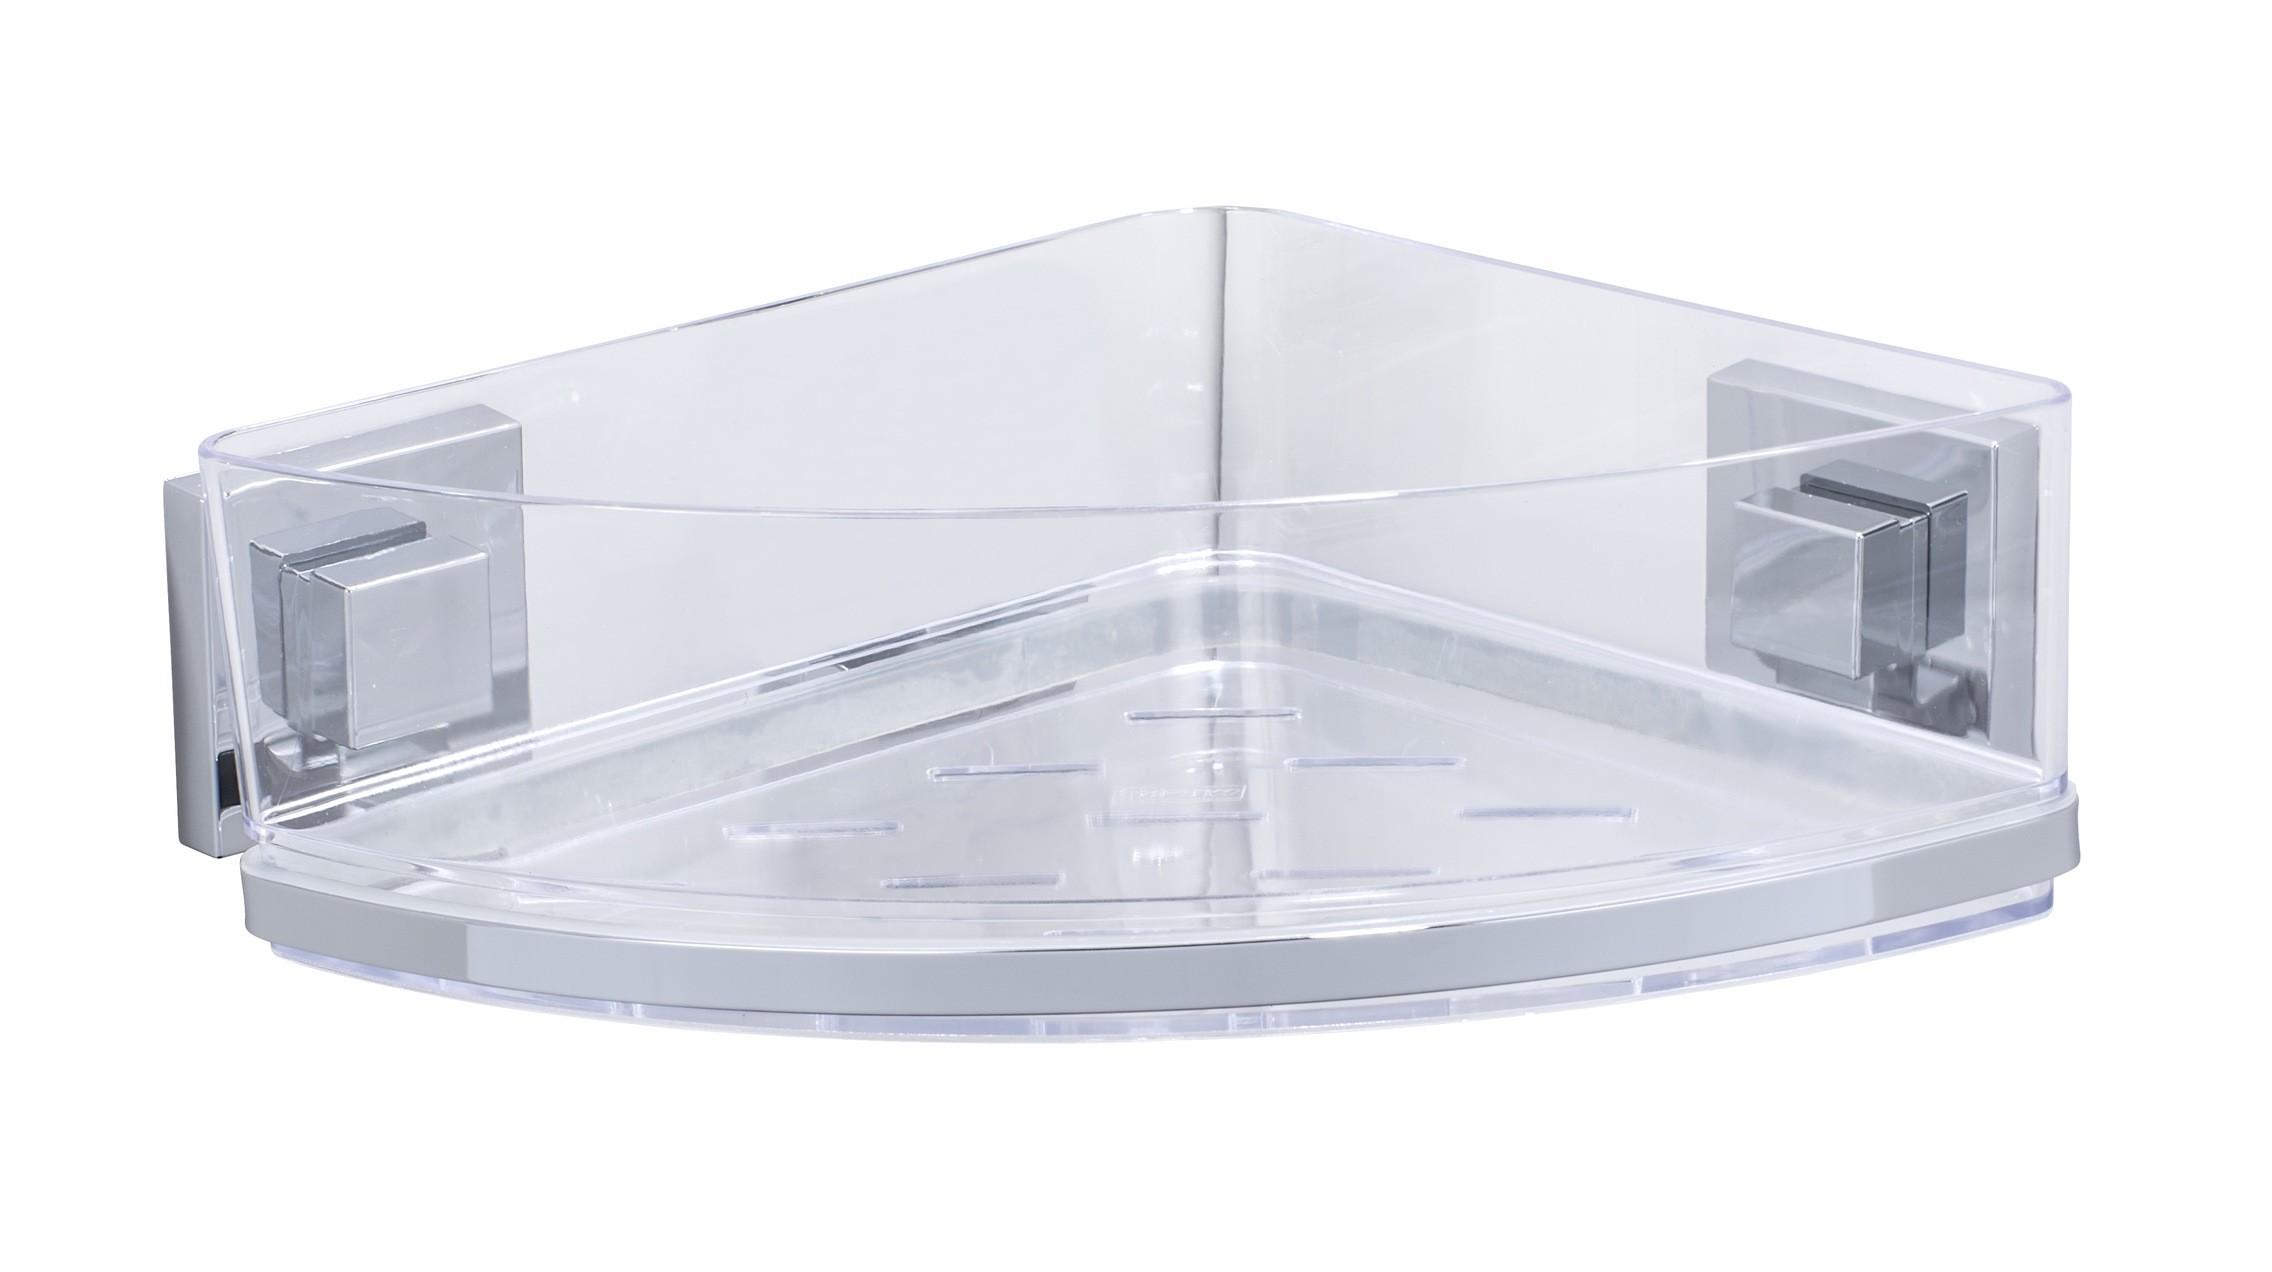 Wenko Vacuum-Loc® Eckablage Quadro, Edelstahl, Befestigen ohne bohren